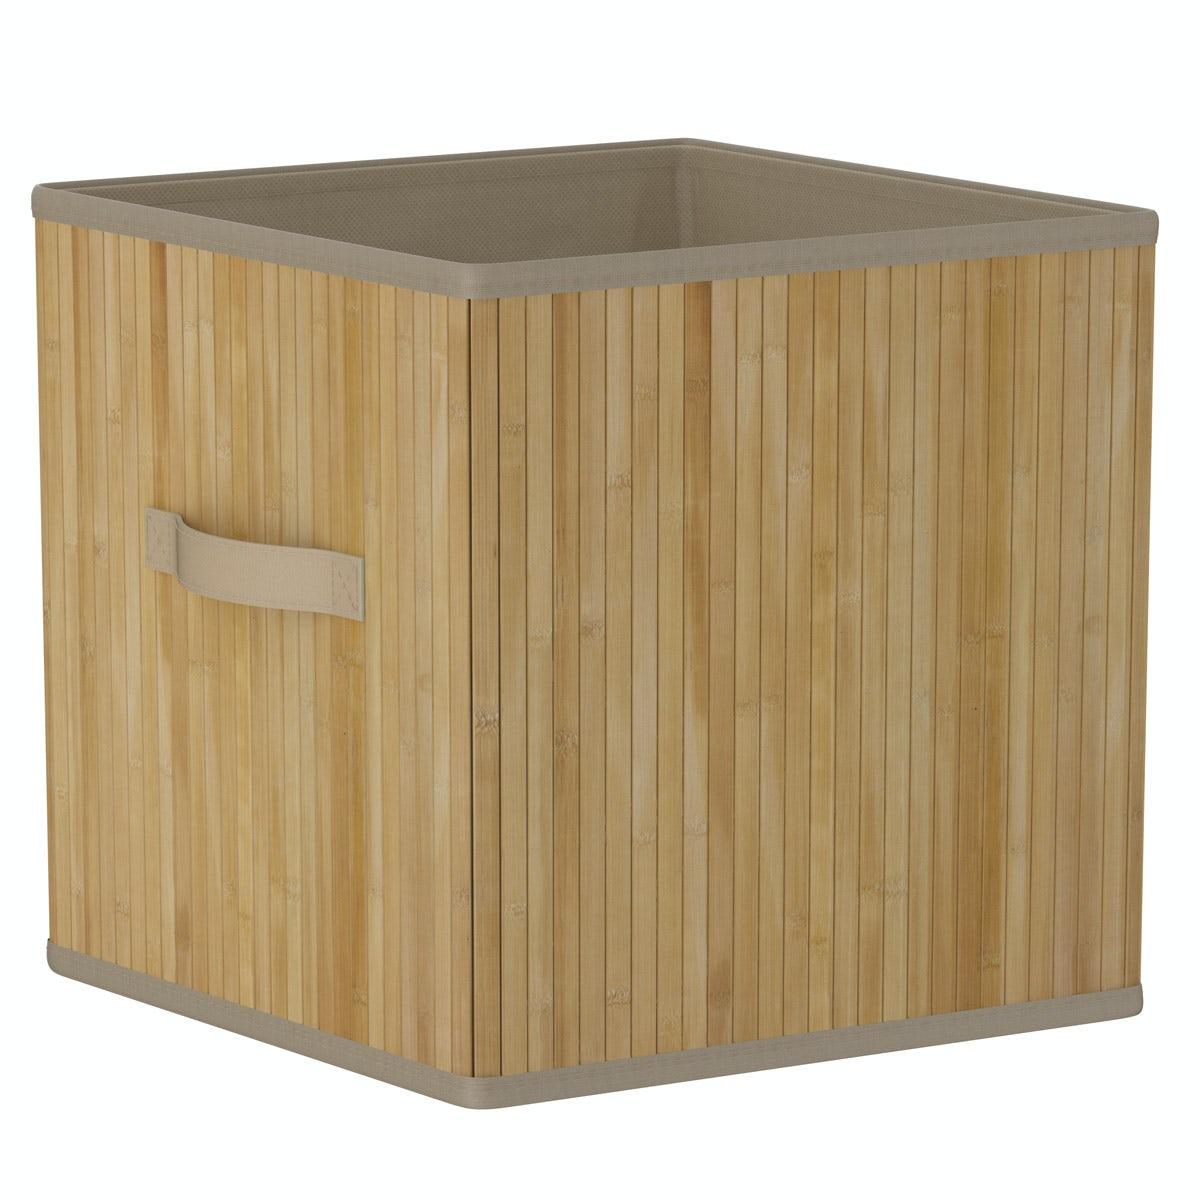 Orchard Natural bamboo storage basket